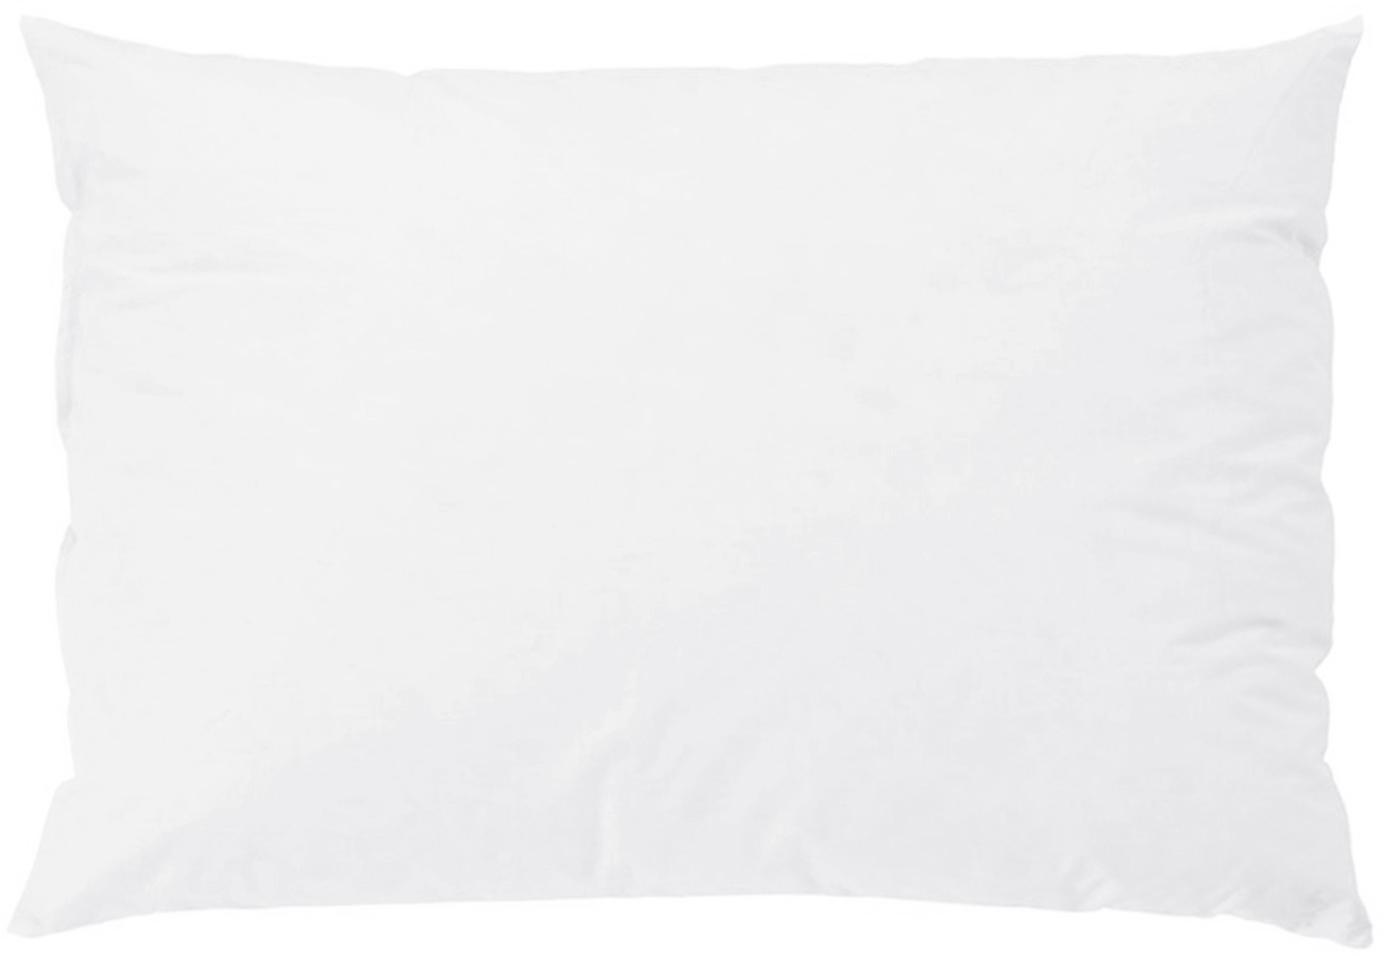 Relleno de cojín Premium, 40x60, Funda: percal Mako, 100%algodón, Blanco, An 40 x L 60 cm